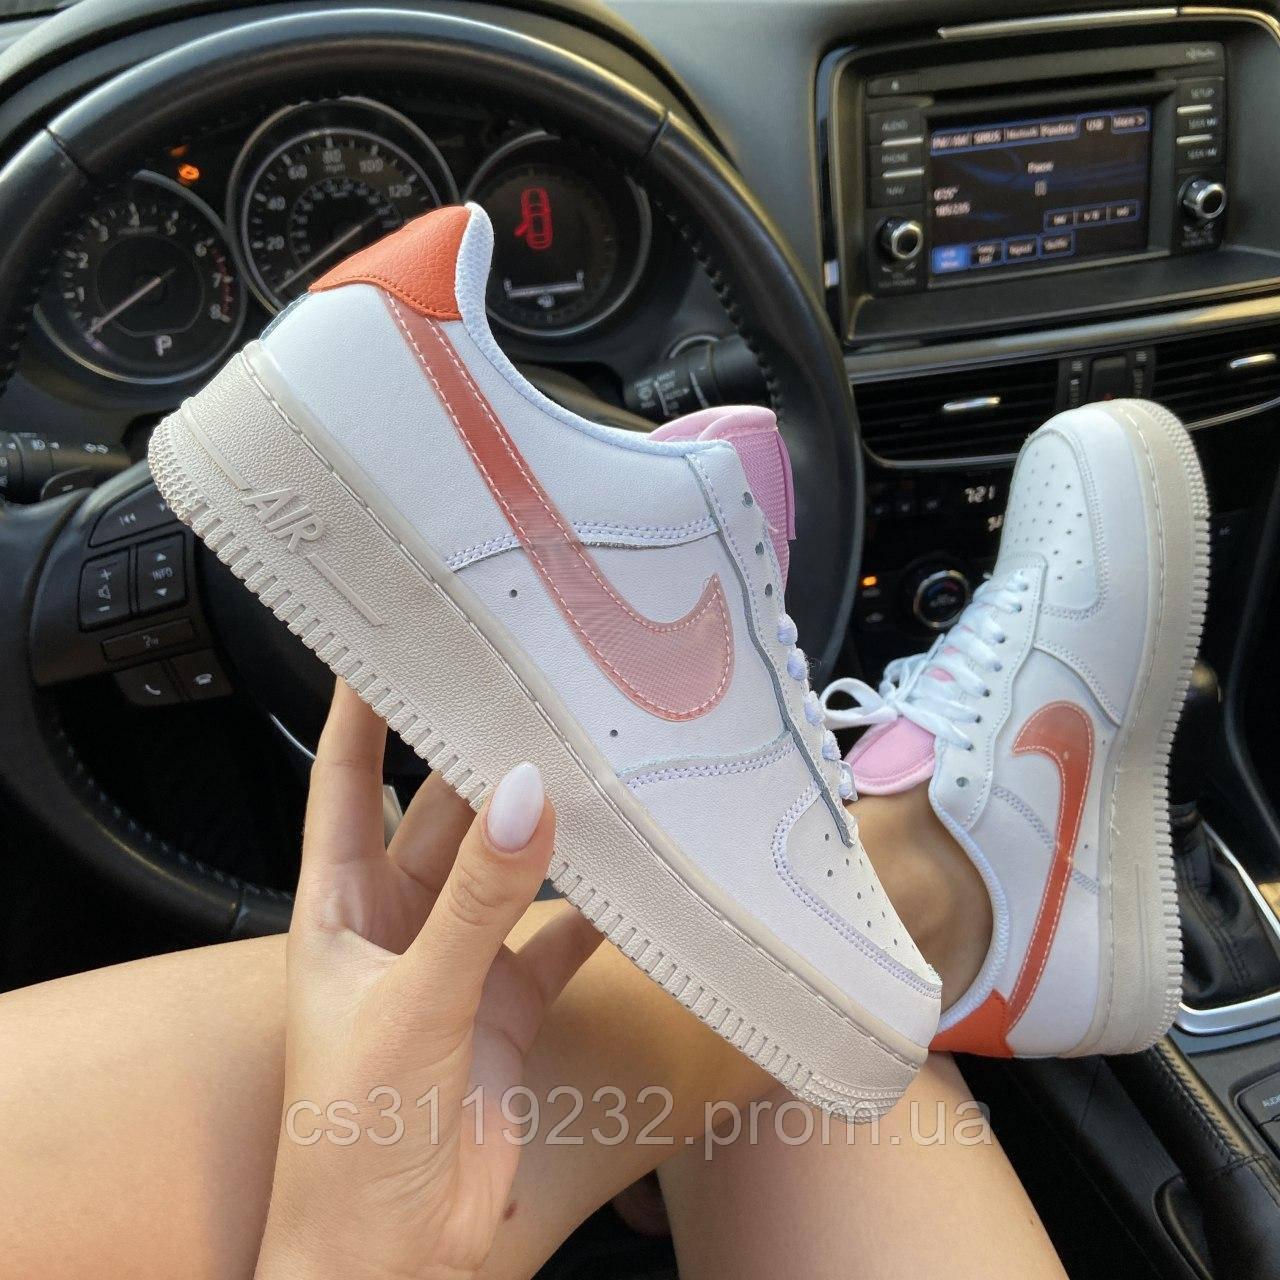 Женские кроссовки Nike Air Force 1 Digital Pink Adds Beige Soles (белый/бежевый)